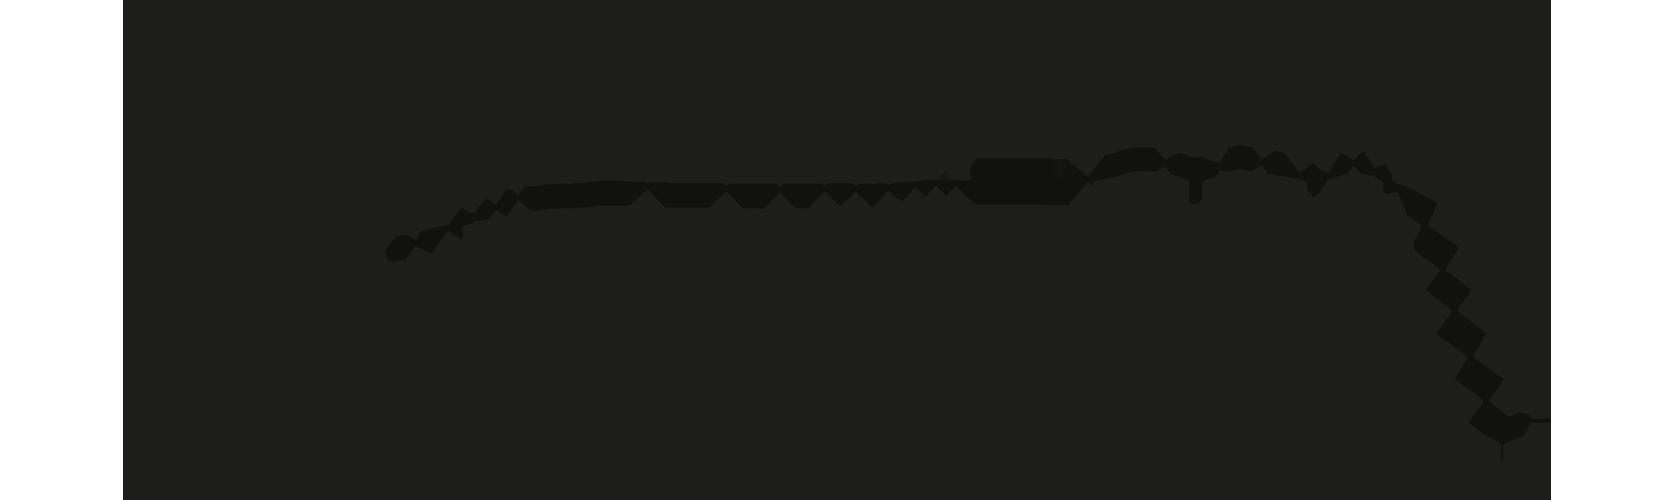 KSM8 周波数応答曲線